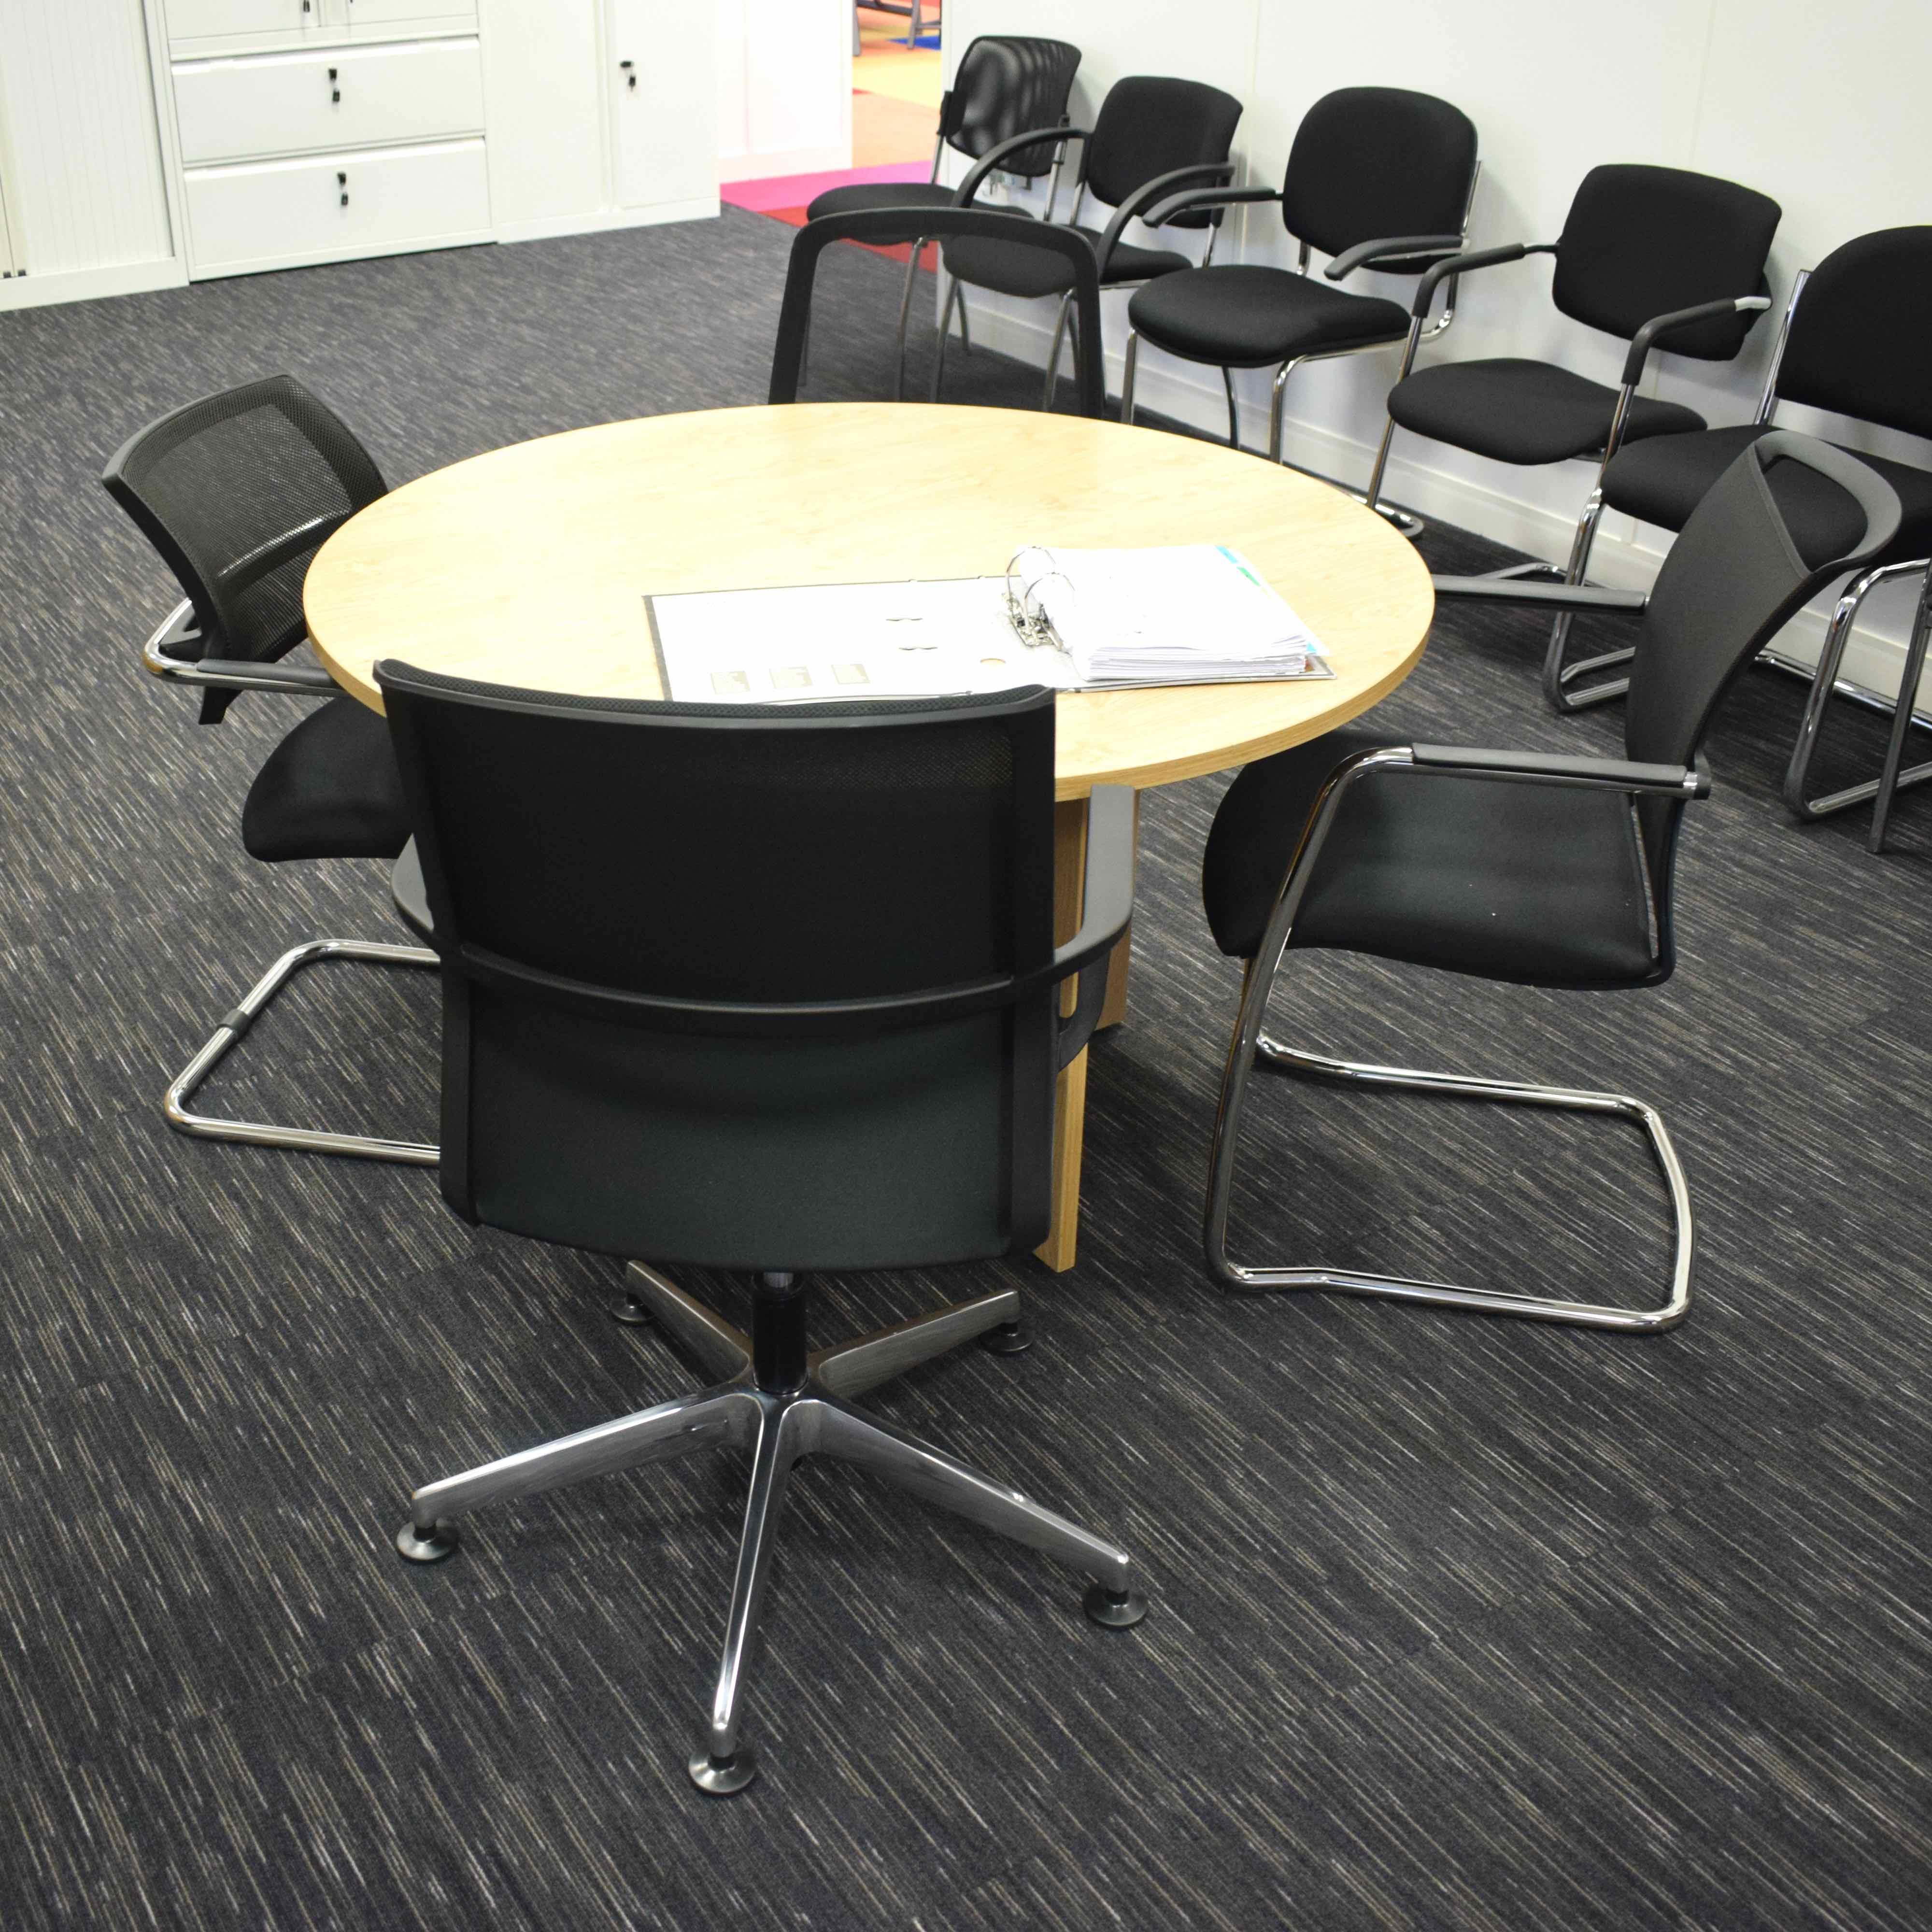 Paragon Carpet Tiles | Strobe | Office Visions Hero